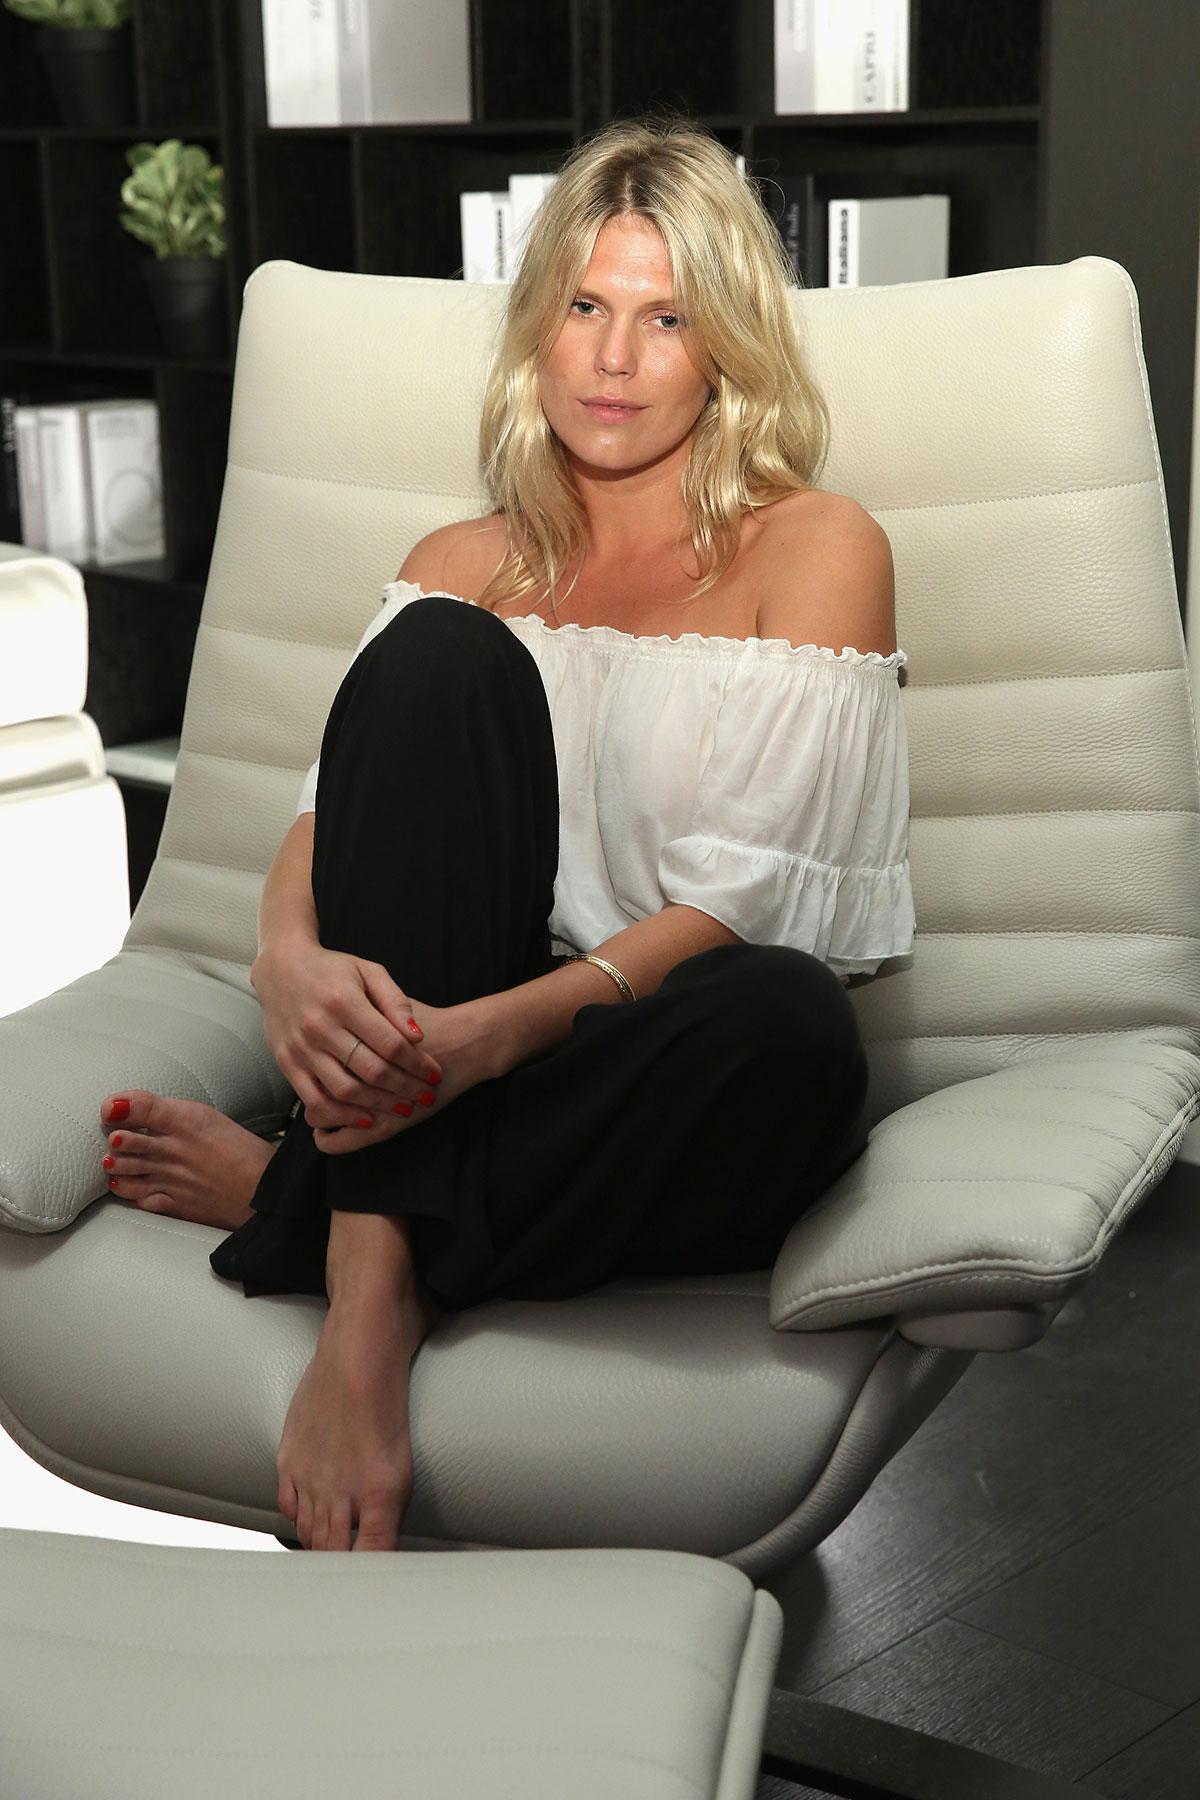 NATUZZI_Miami_ALEXANDRA_RICHARDS-on-the-Natuzzi-Revive-armchair_Photo-by-Monica-Schipper_Getty-Images.jpg